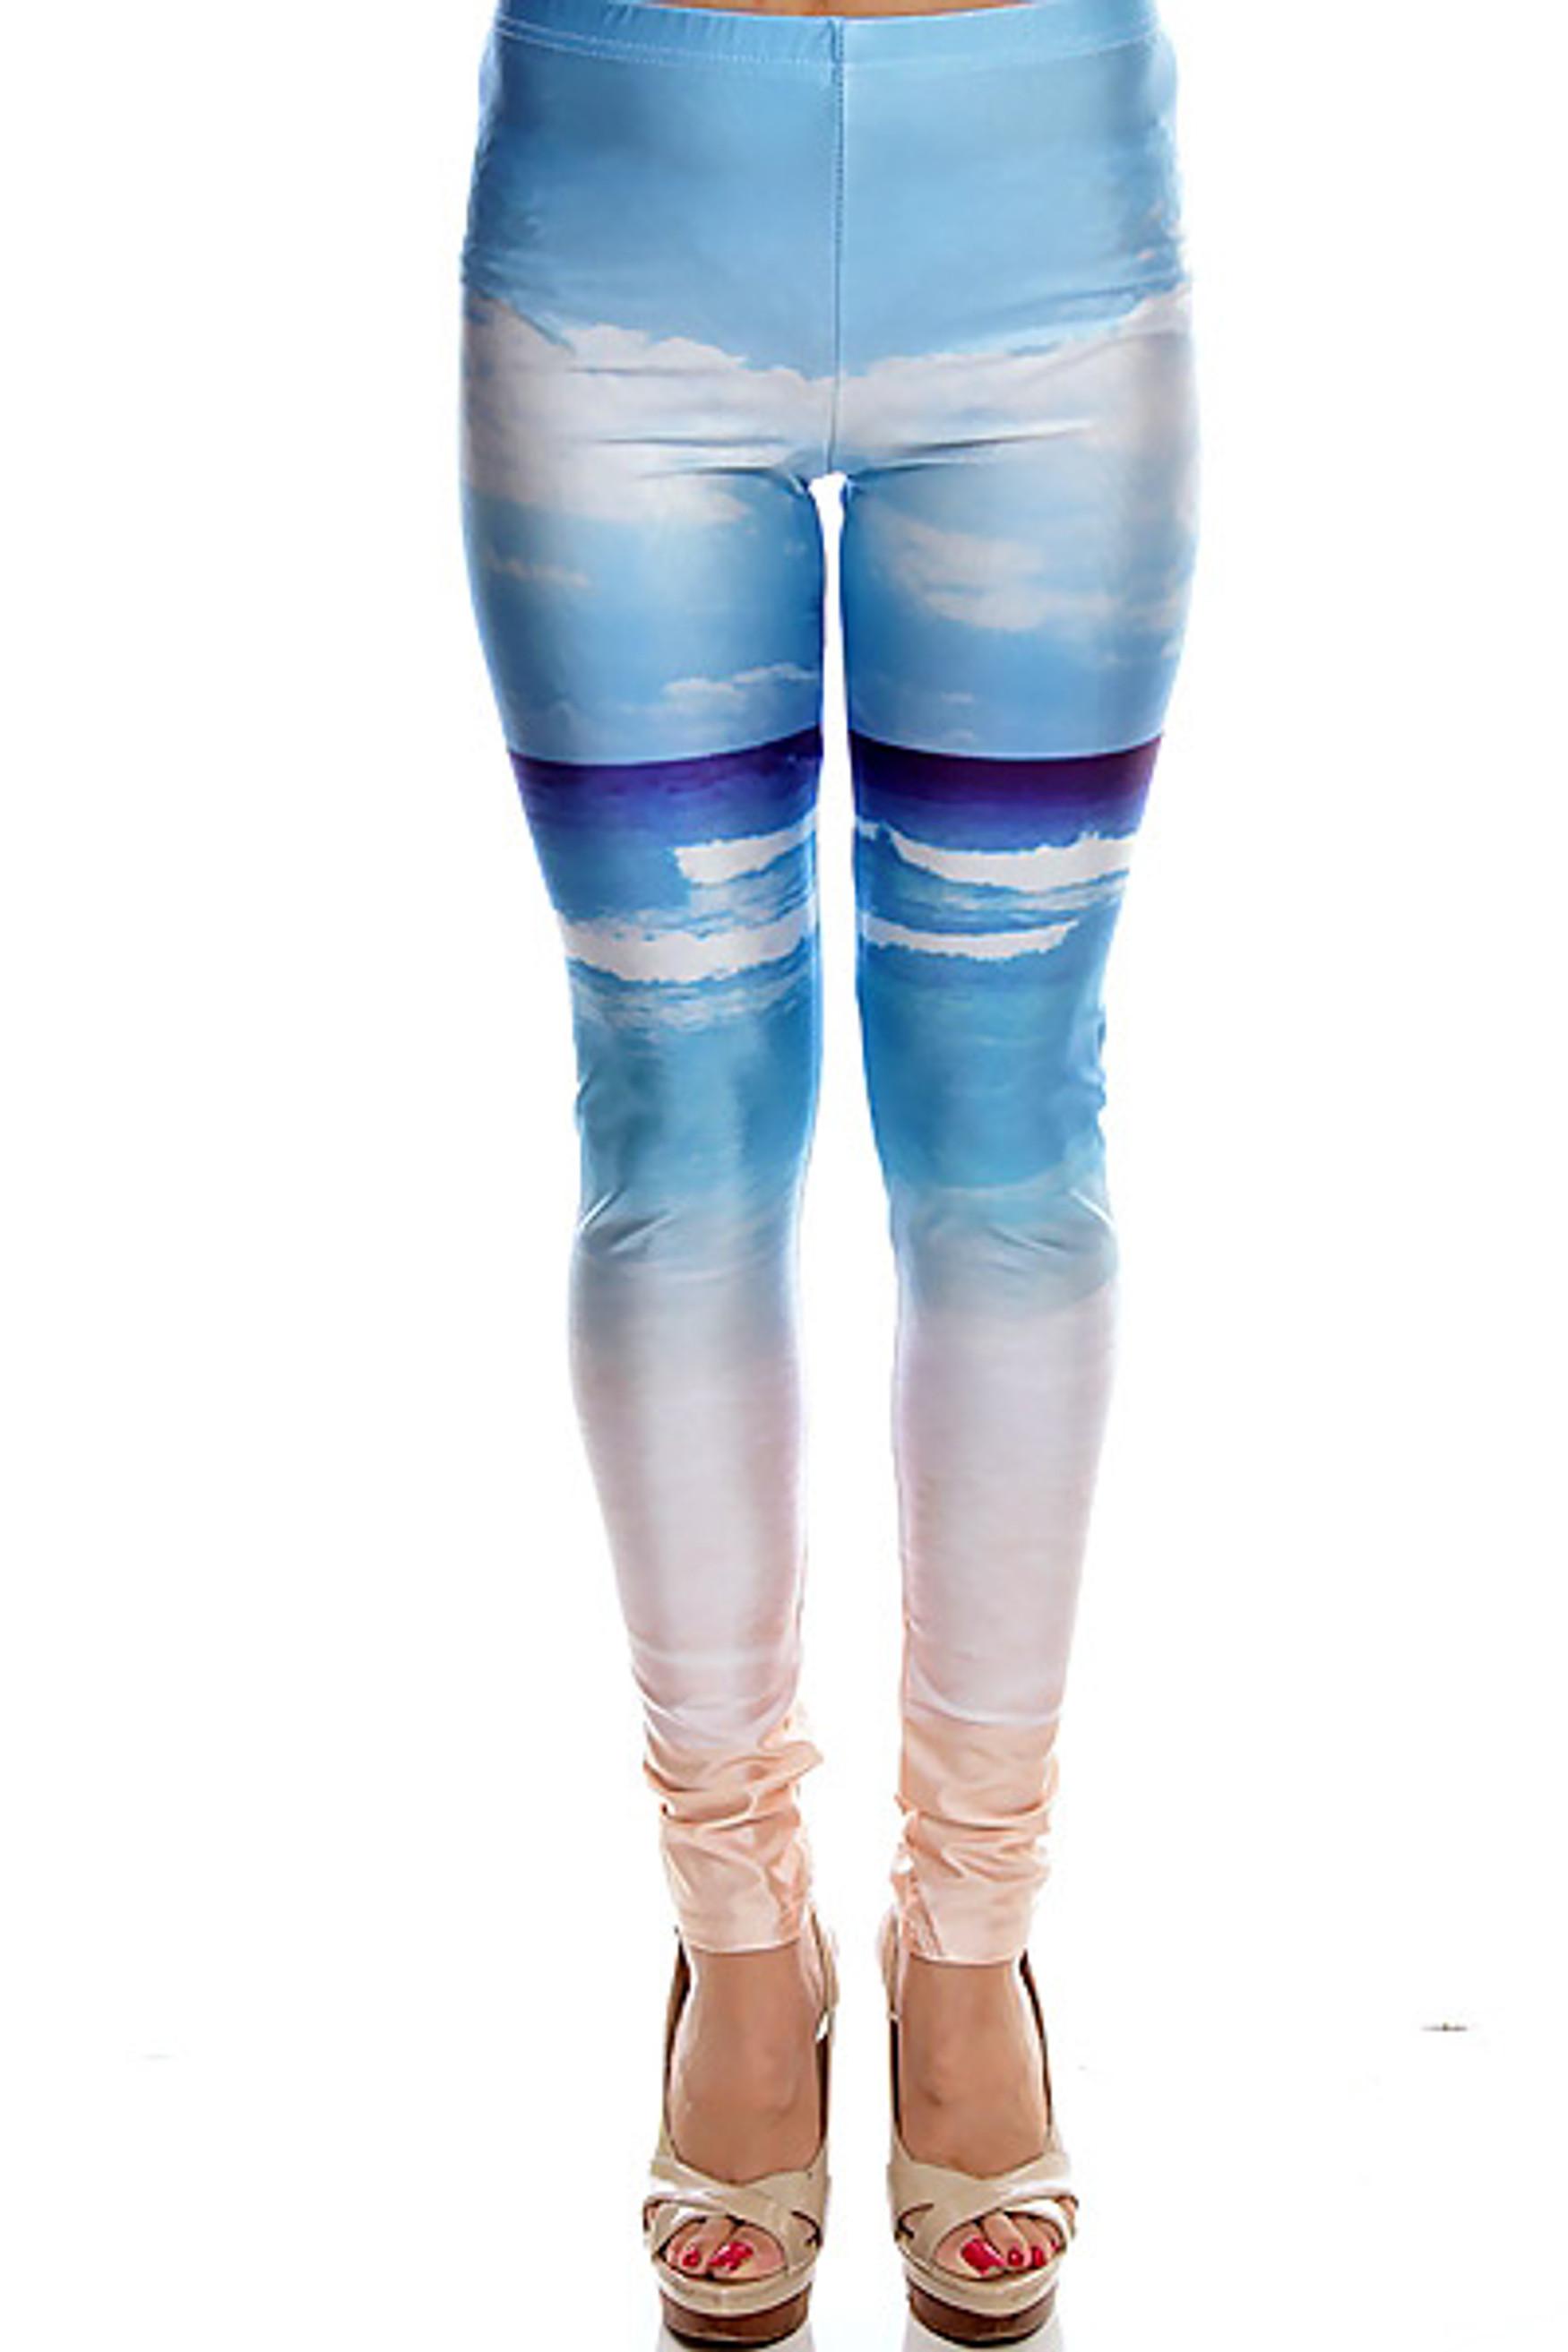 Cool Blue Seashore Leggings